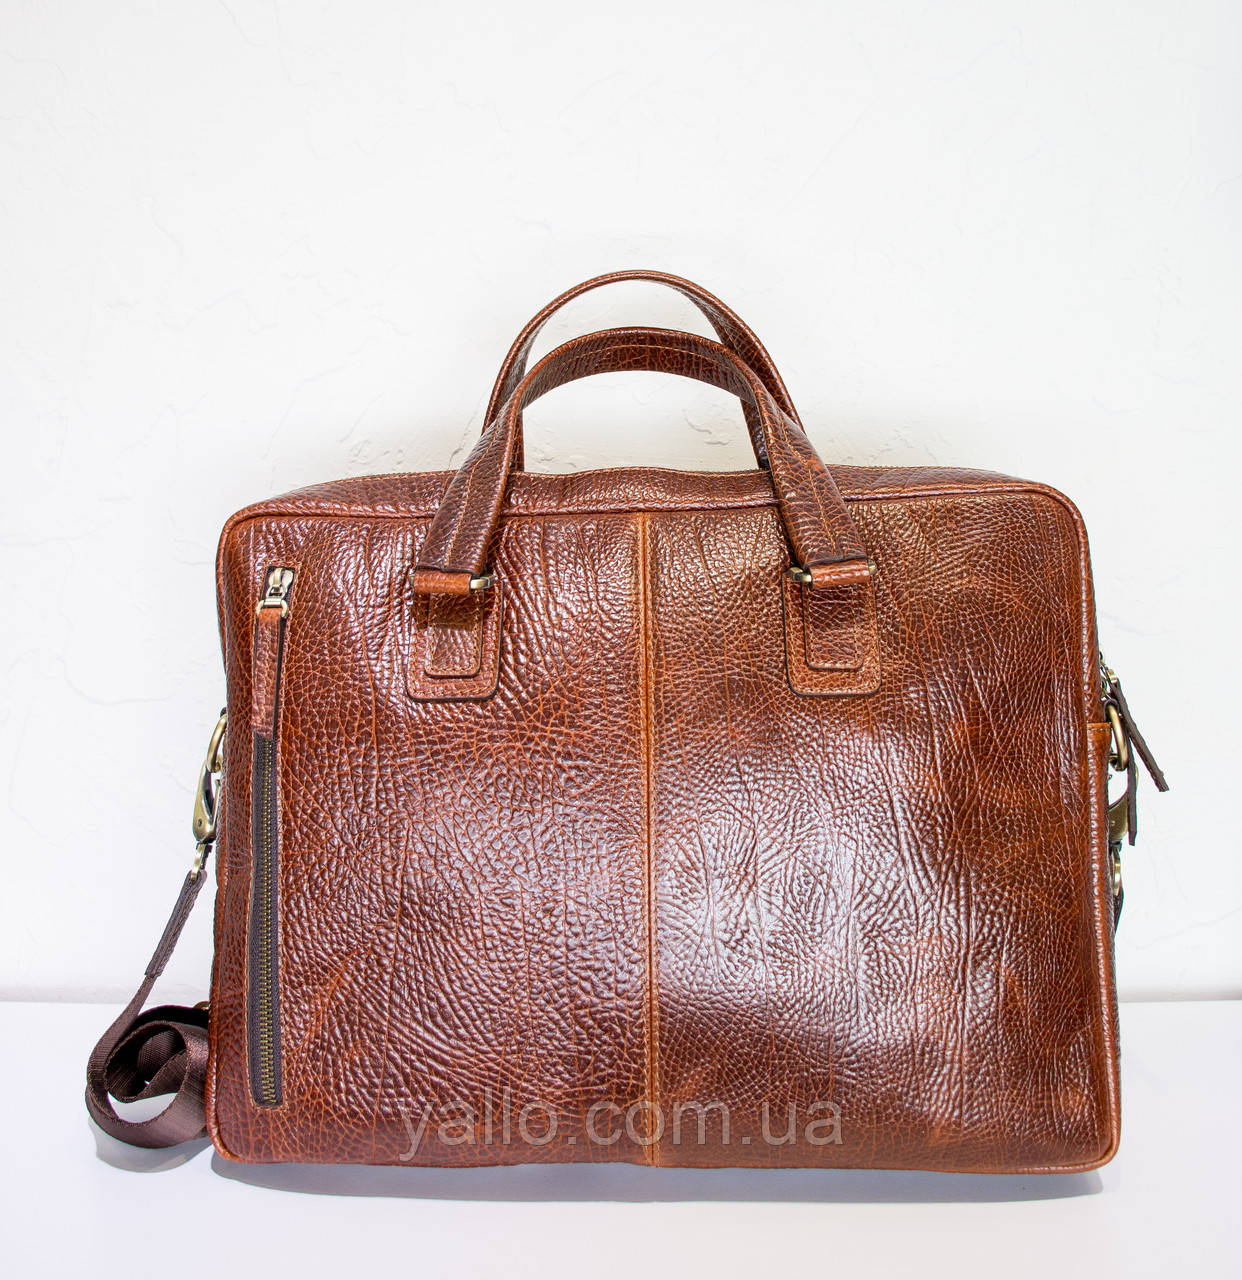 Натуральная кожаная сумка для мужчин Tony Bellucci T5095-896